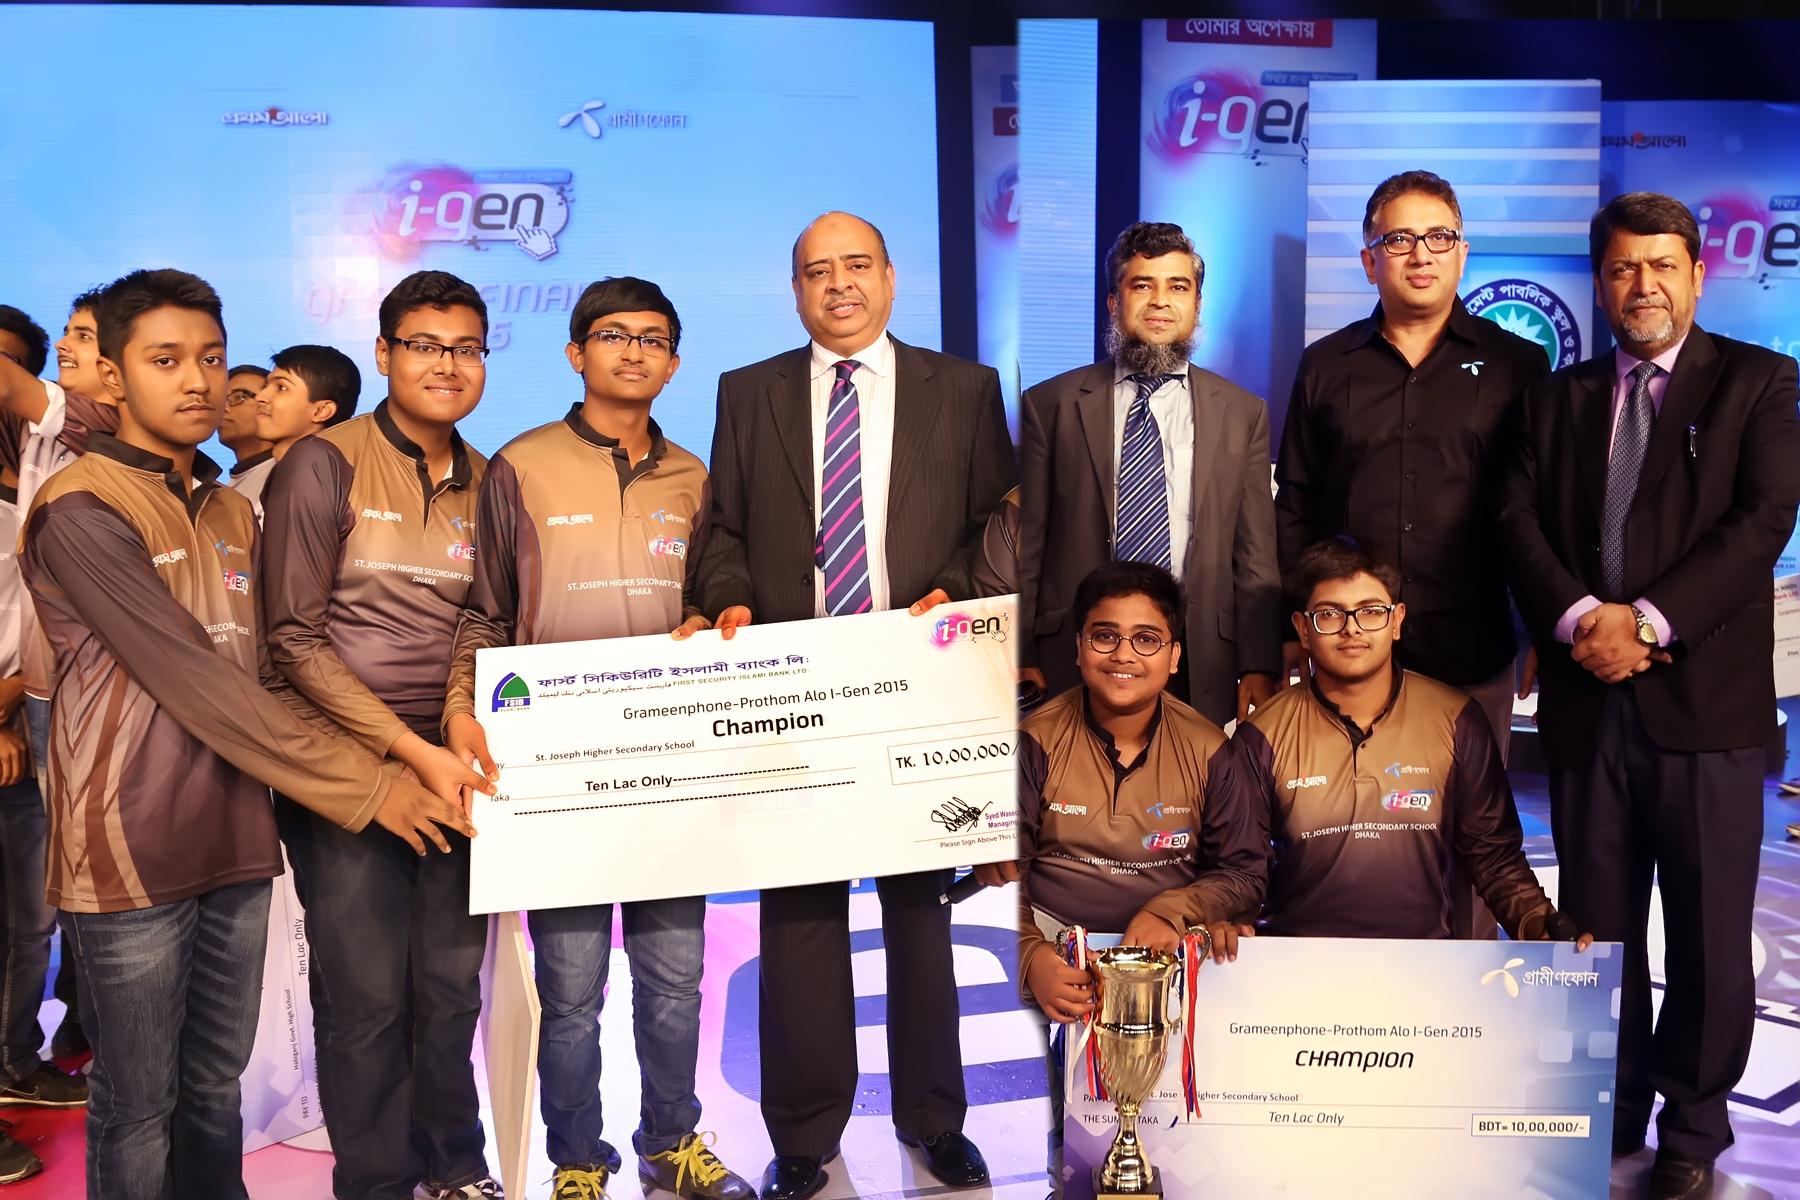 First Security Islami Bank Limited Sponsored Grameenphone-Prothom Alo iGen-2015